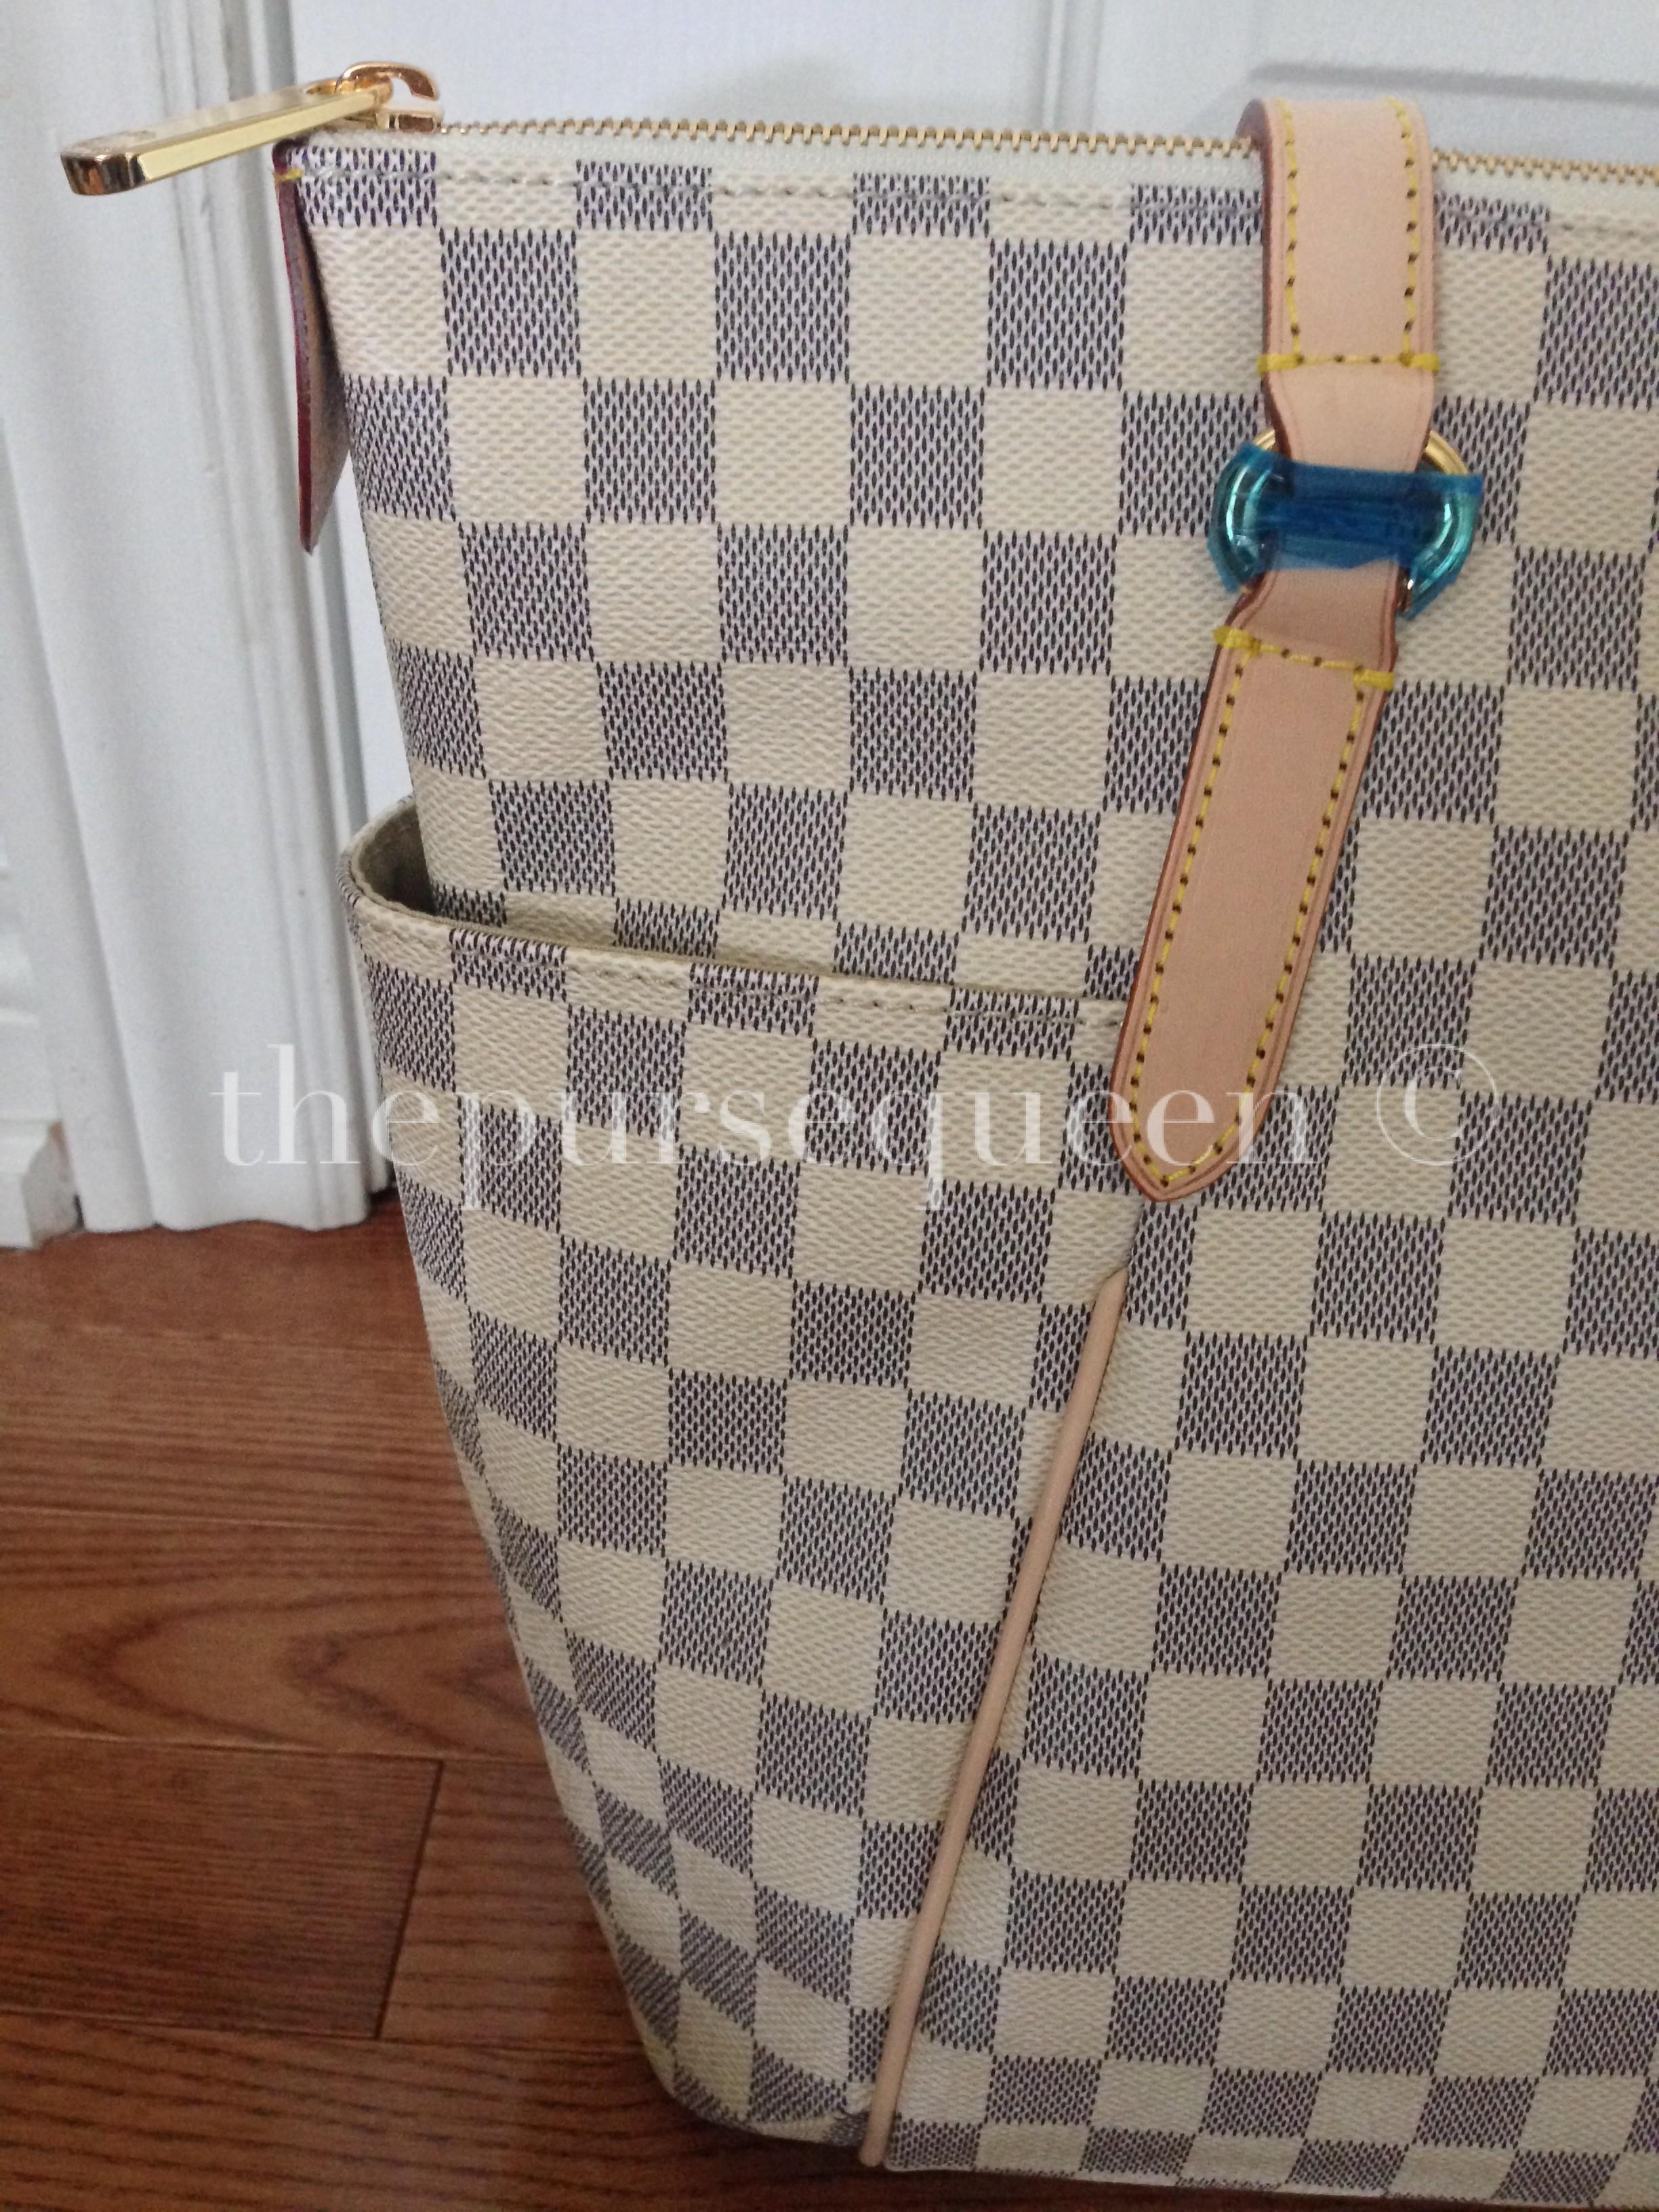 426f922e4ccd Louis Vuitton Totally GM Review (Replica Handbag) - Authentic ...